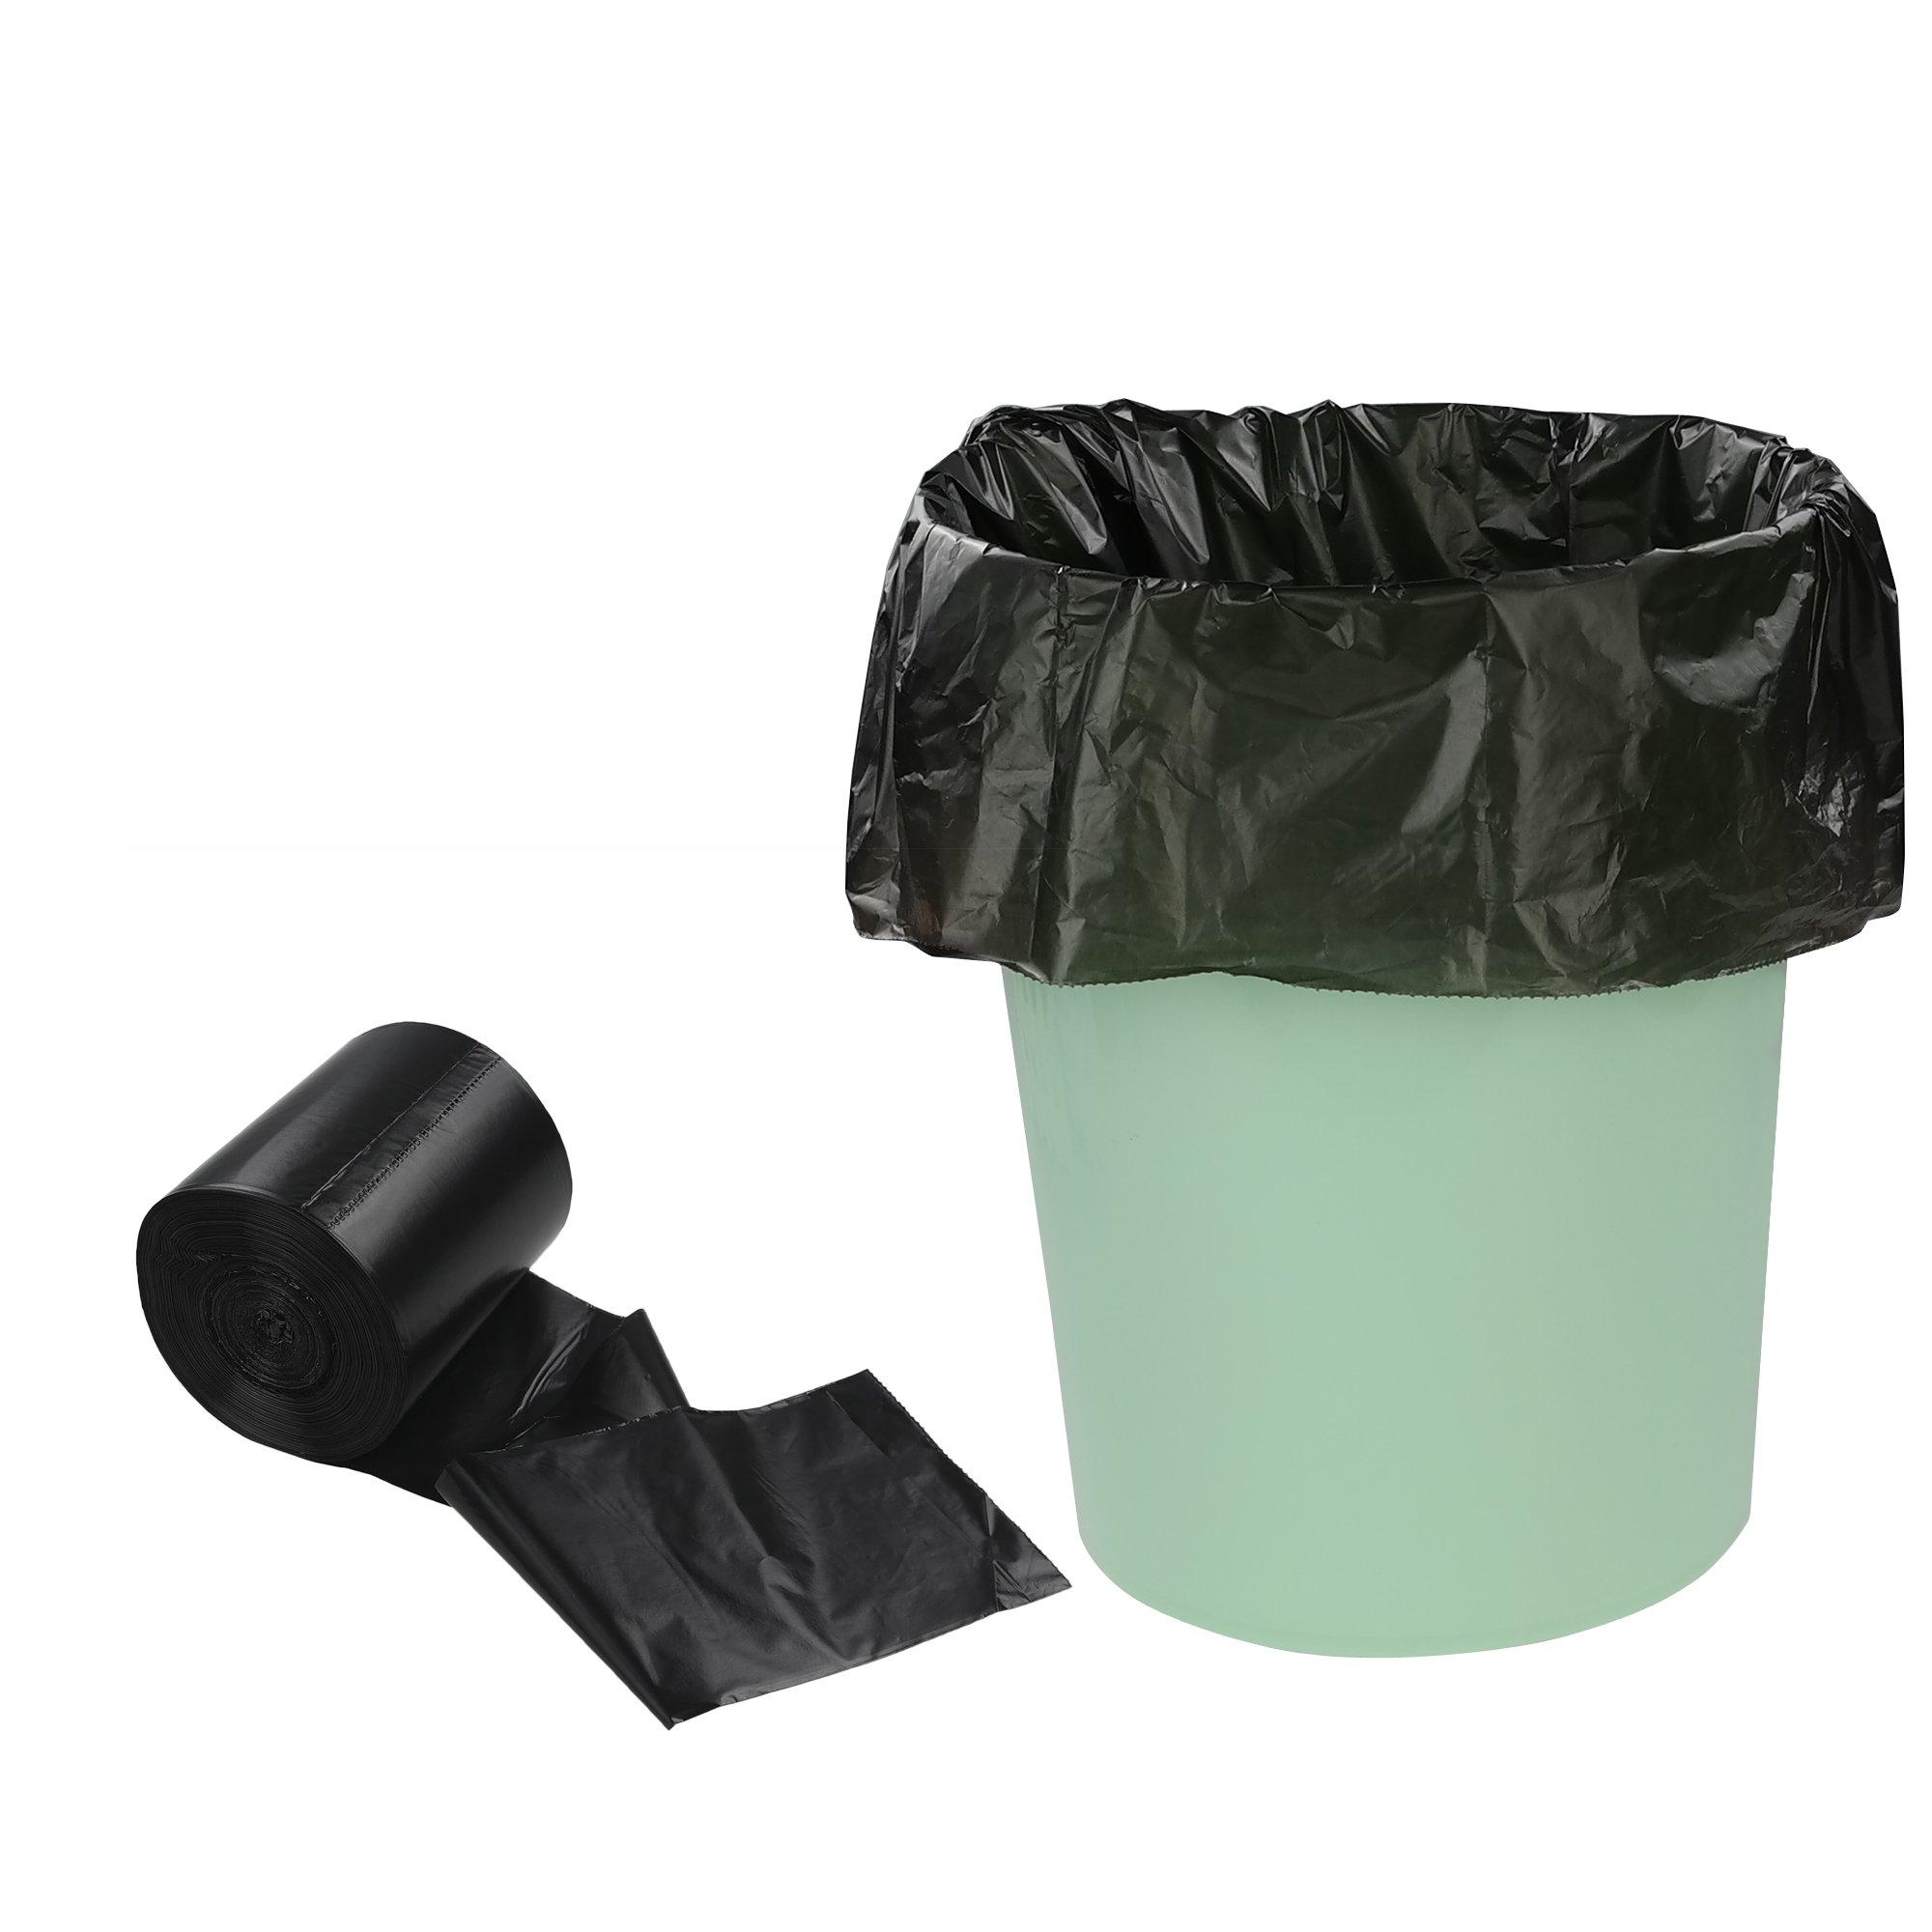 Eagrye 6 Gallon Black Office Trash Bags, 90 Counts